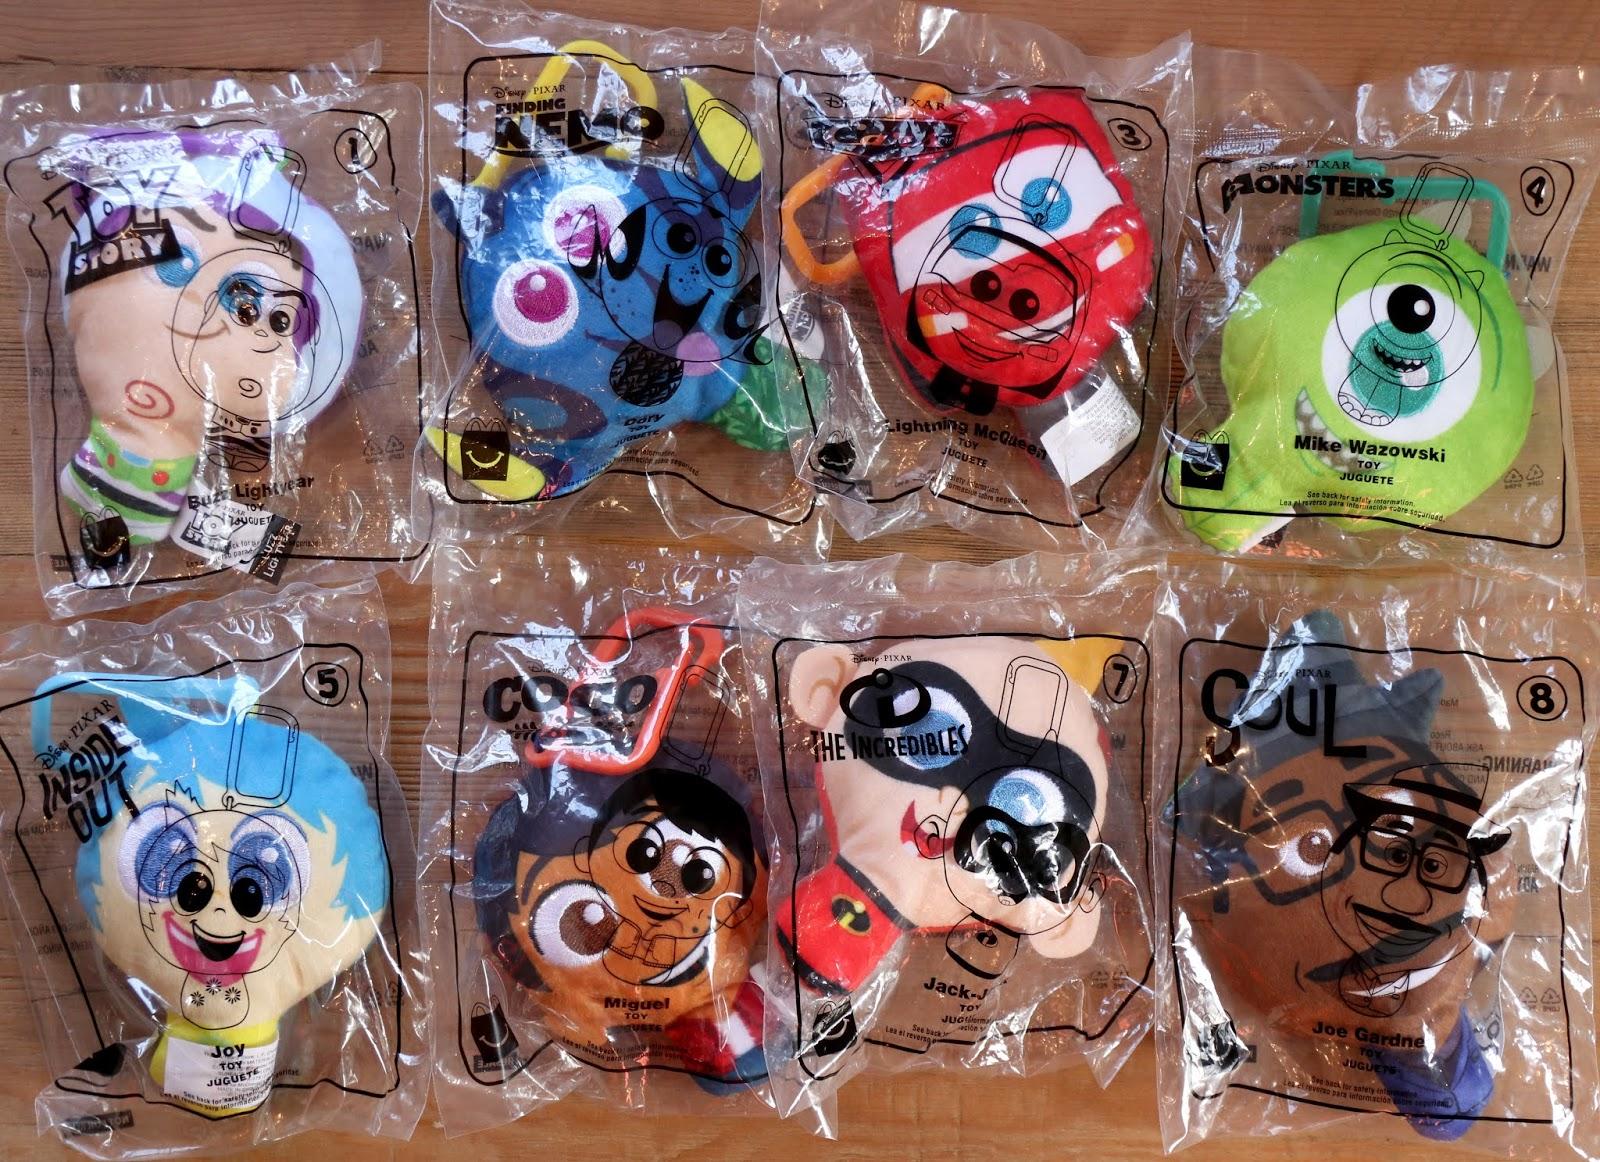 pixar plush keychain mcdonald's toys 2020